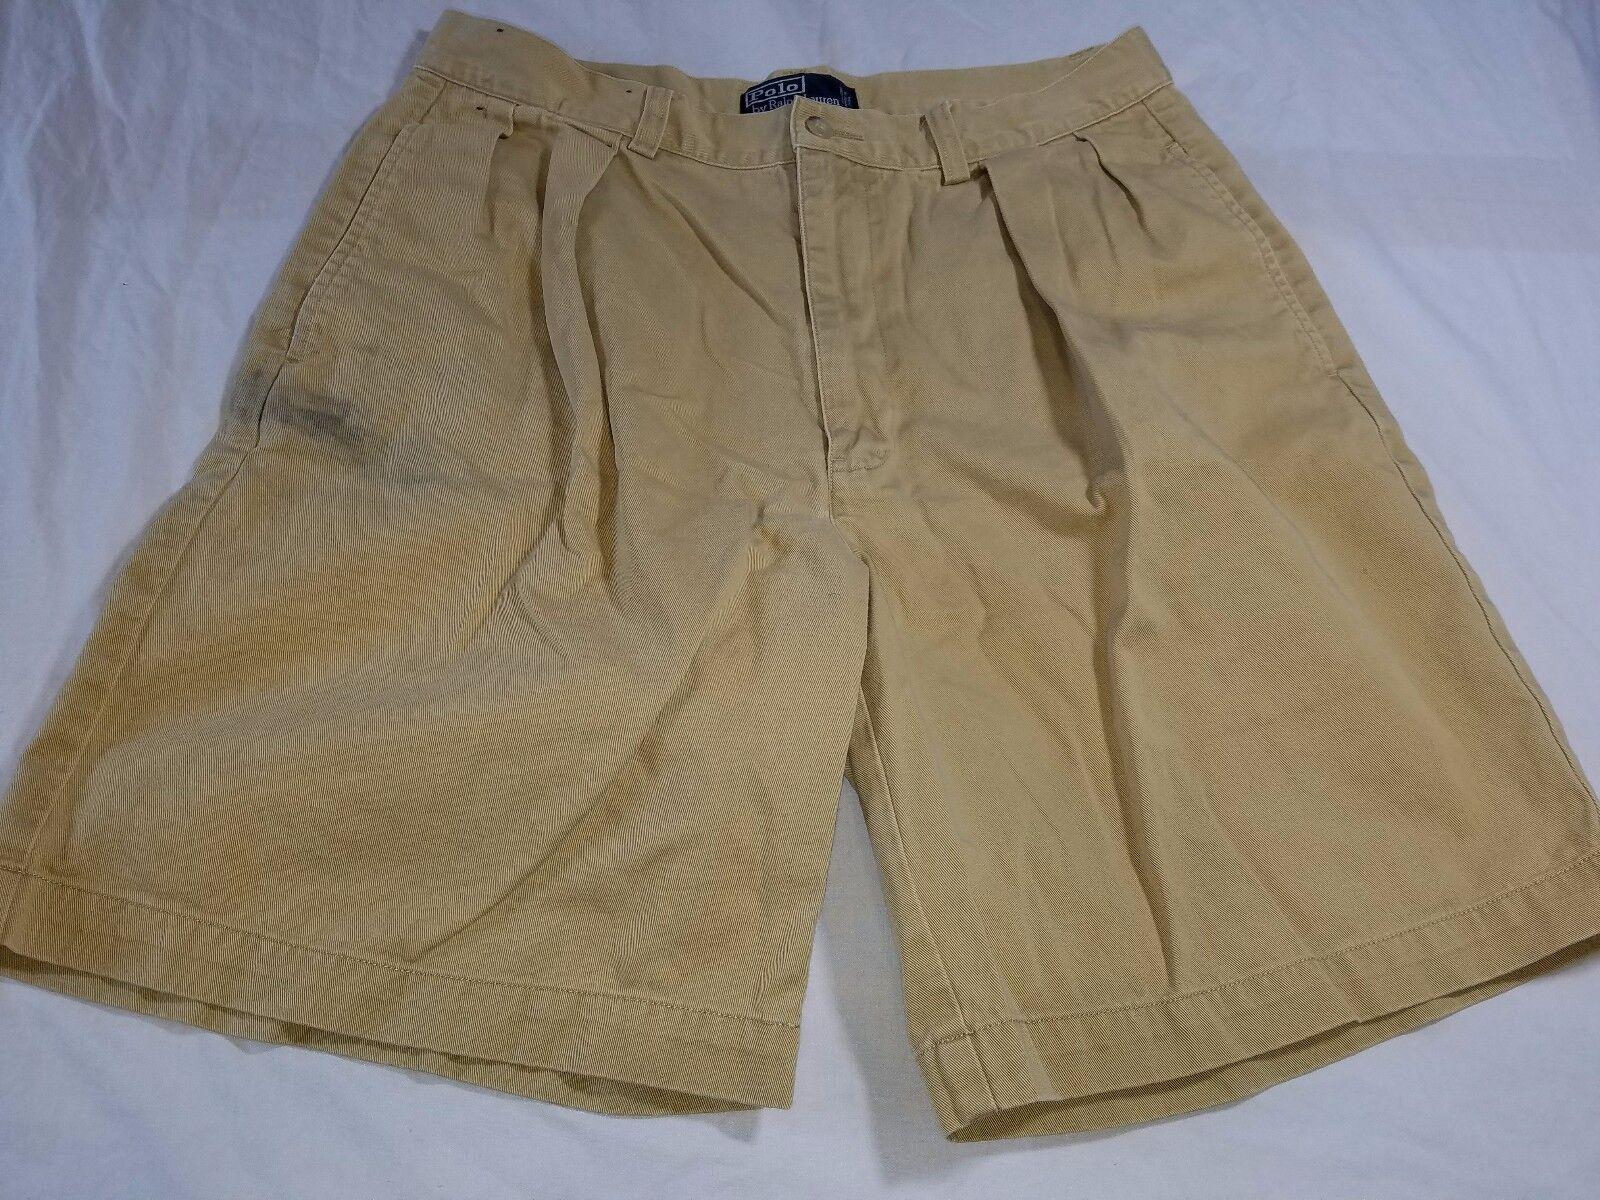 Vintage Polo by Ralph Lauren Casual Tyler Men's Short Size 33